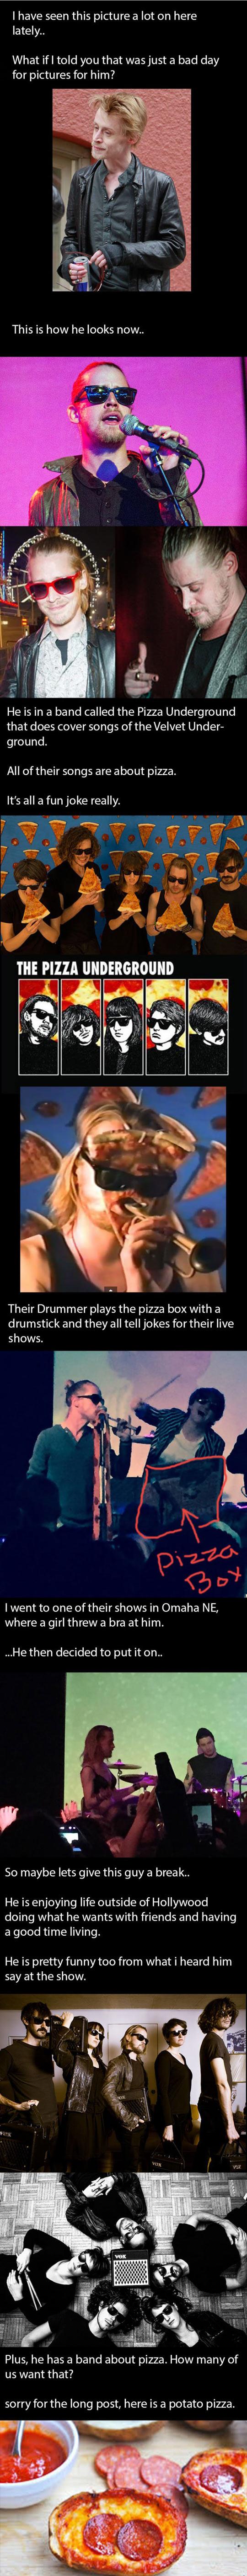 funny-Macaulay-Culkin-Pizza-Underground-band